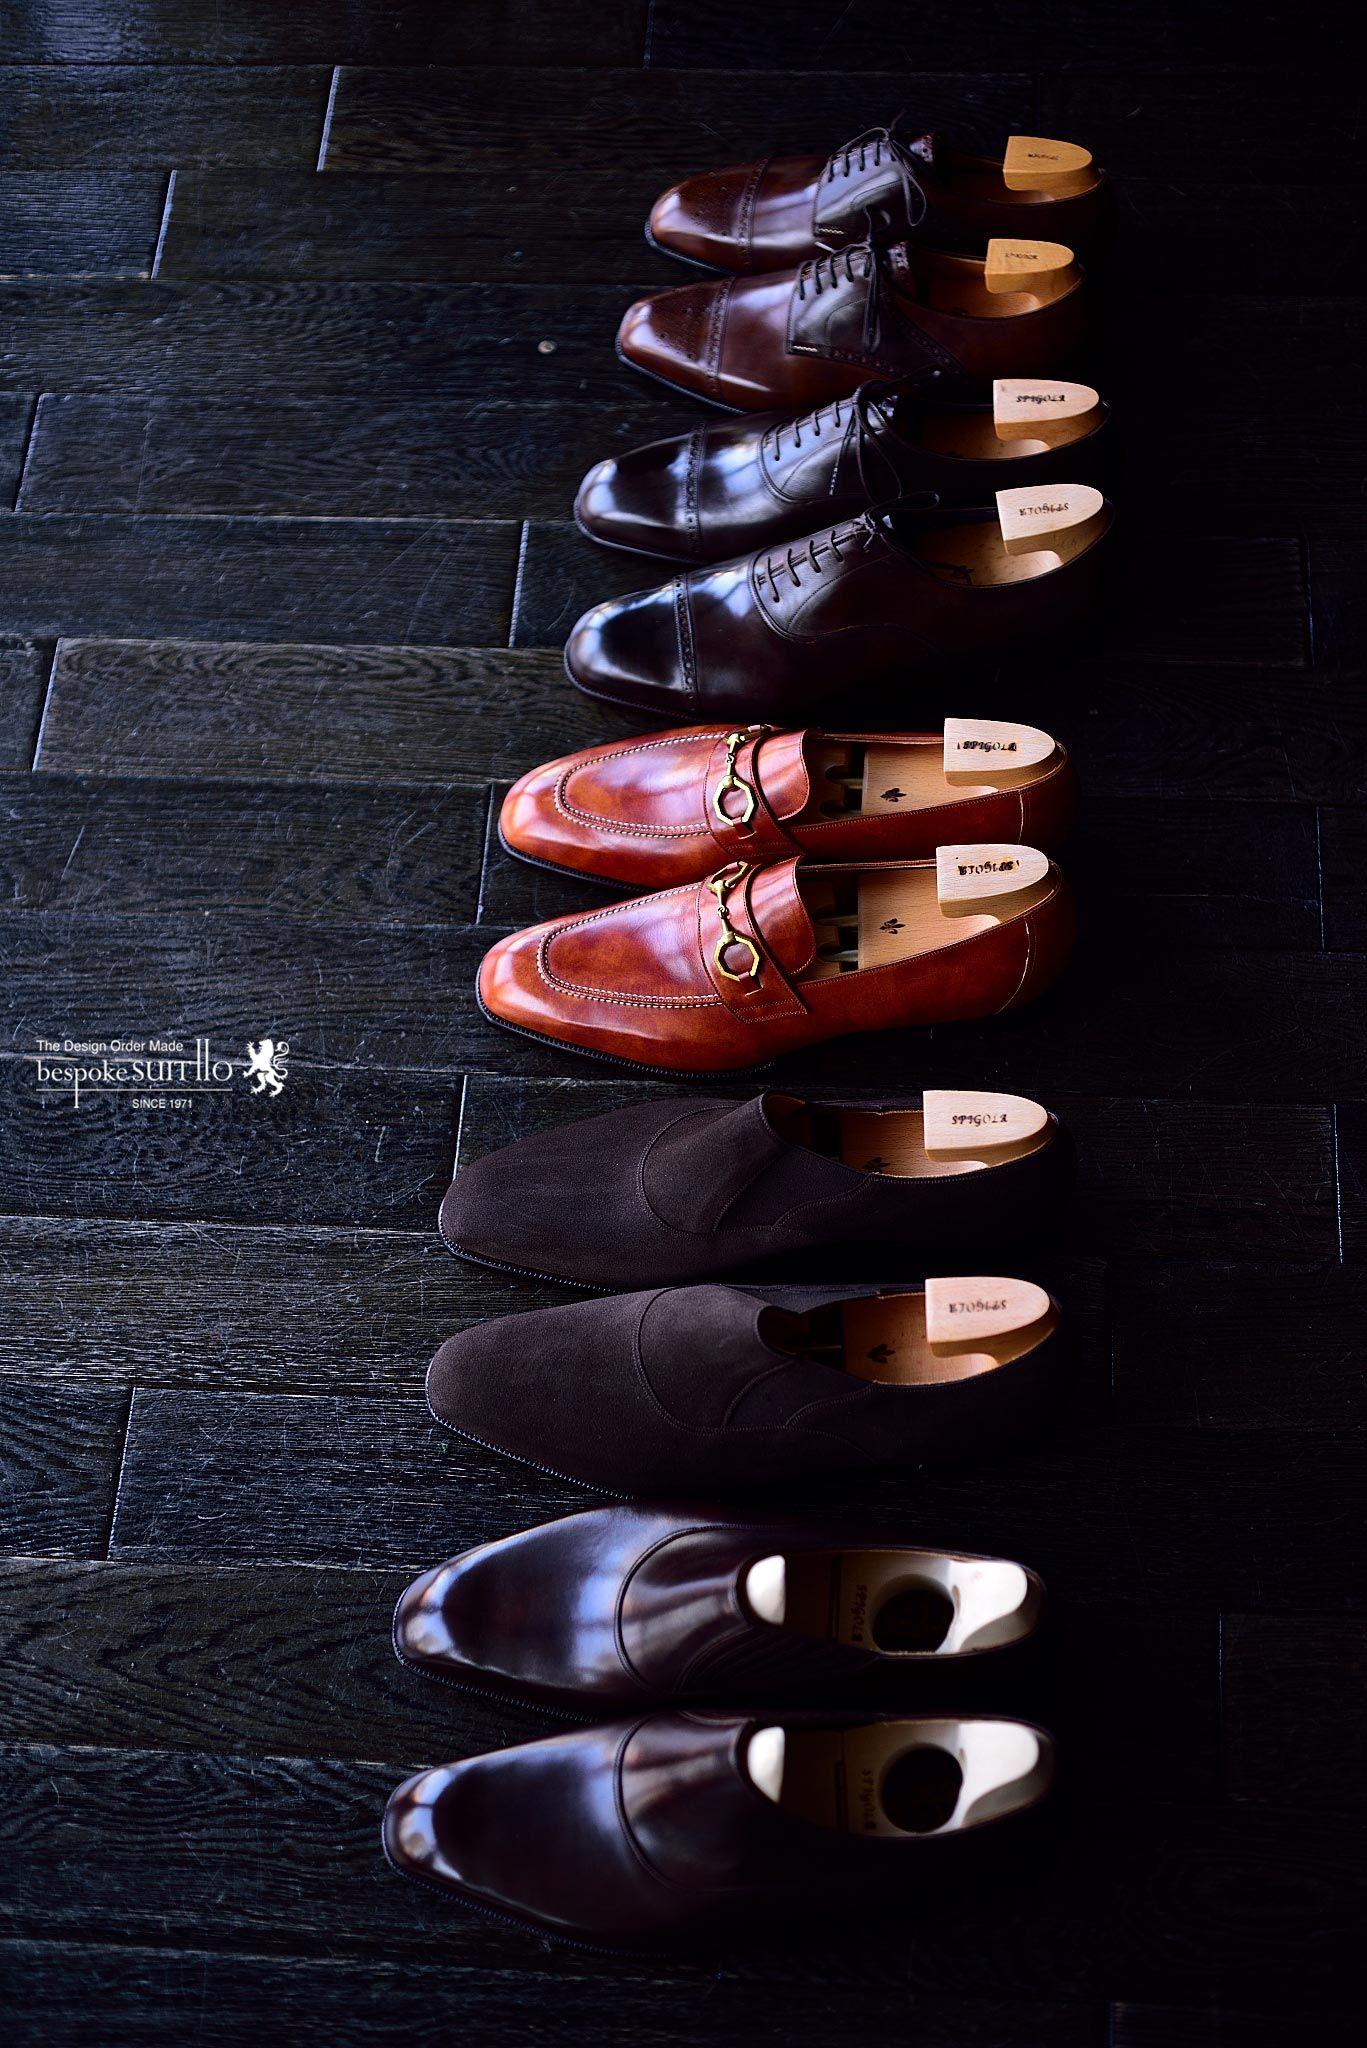 SPIGOLA(スピーゴラ)の靴職人、鈴木幸次のオーダー靴作品。,鈴木幸次,KojiSuzuki,スピーゴラ,SPIGOLA,bespokeShoes,神戸,オーダー靴,革靴,ANTICA BOTTEGA DELLA SPIGOLA,トランクショー,受注会,オーダー,誂え,紳士,オーダーメイド,福岡,八幡西区,黒崎,北九州,ビスポークスーツ110,bespokeSUIT110,bespokeSUITIIO,